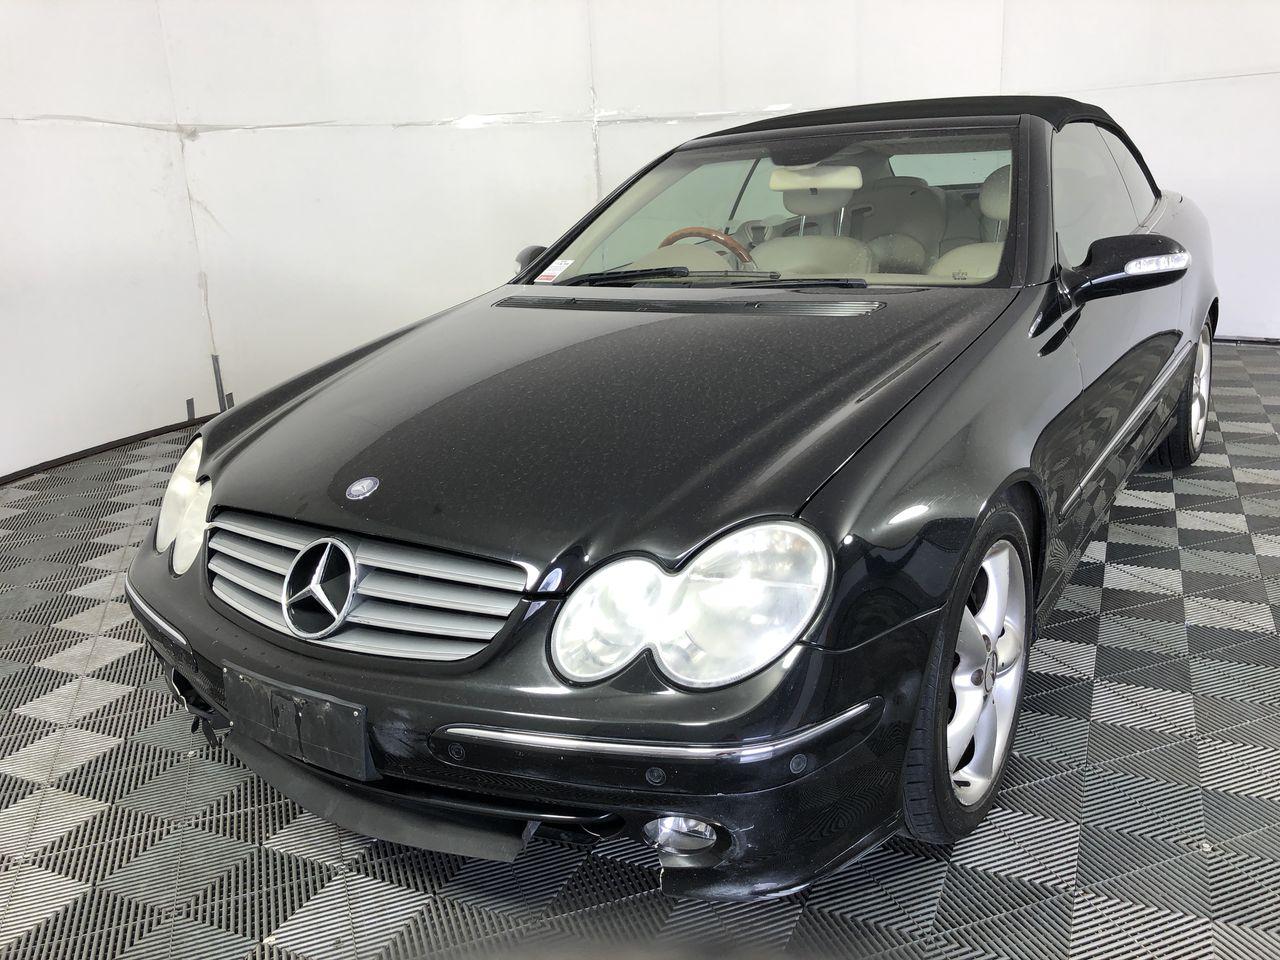 2003 Mercedes Benz CLK320 Avantgarde Auto Convertible, 133,418km